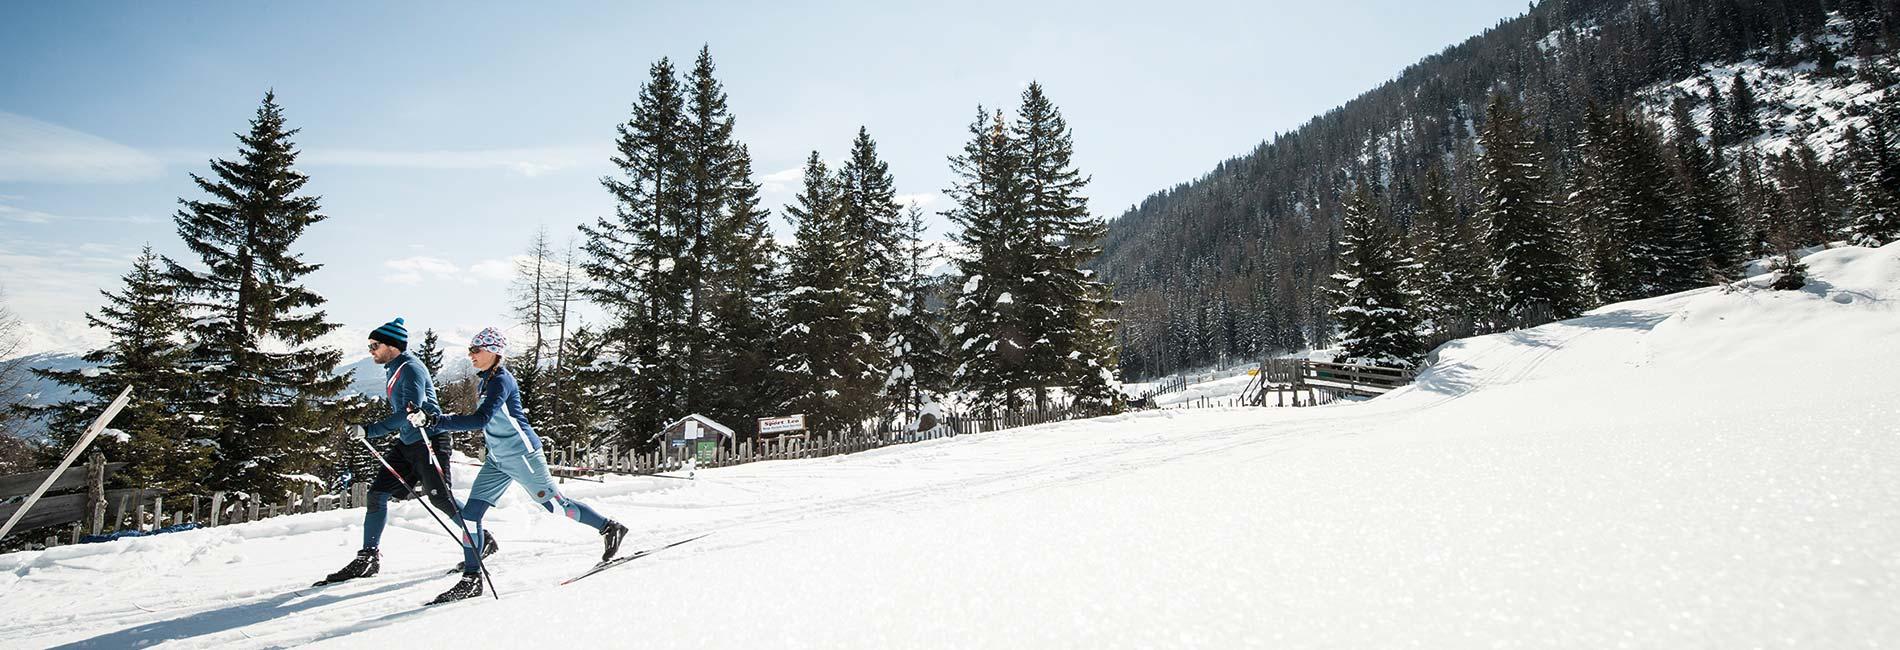 Winterurlaub im Stubaital Hotel Almhof Neustift Milders Tirol